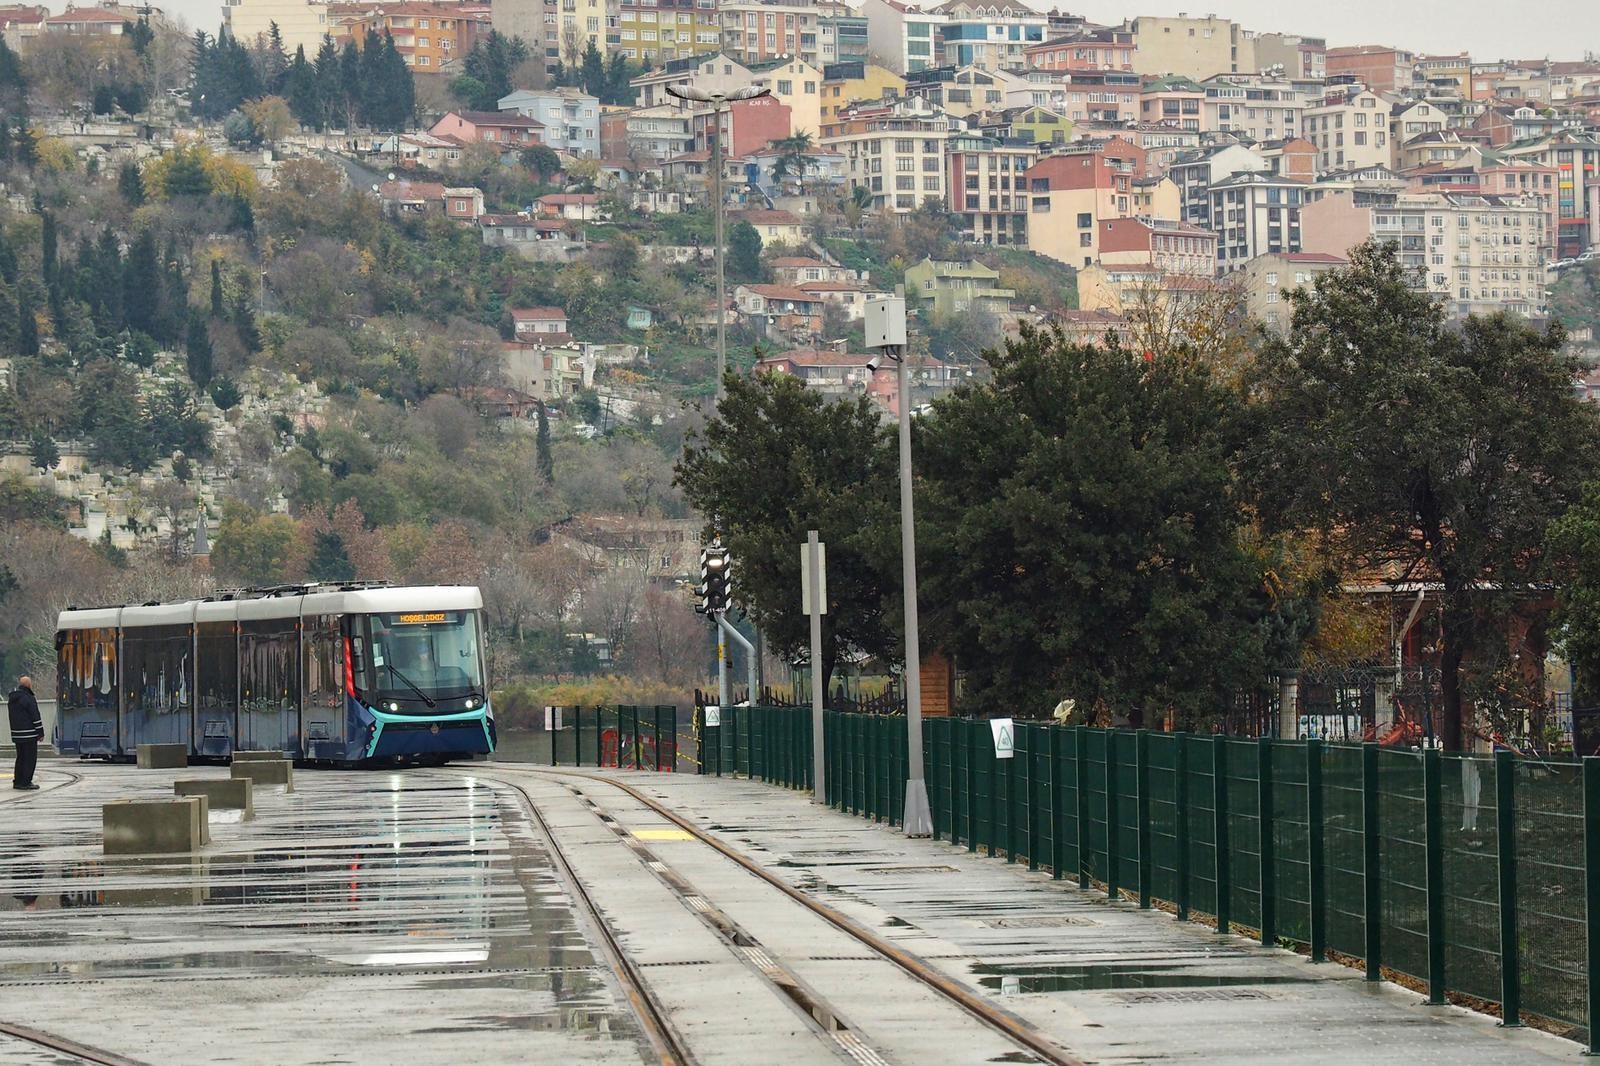 The Eminonu-Alibeykoy tramway in Istanbul, Turkey